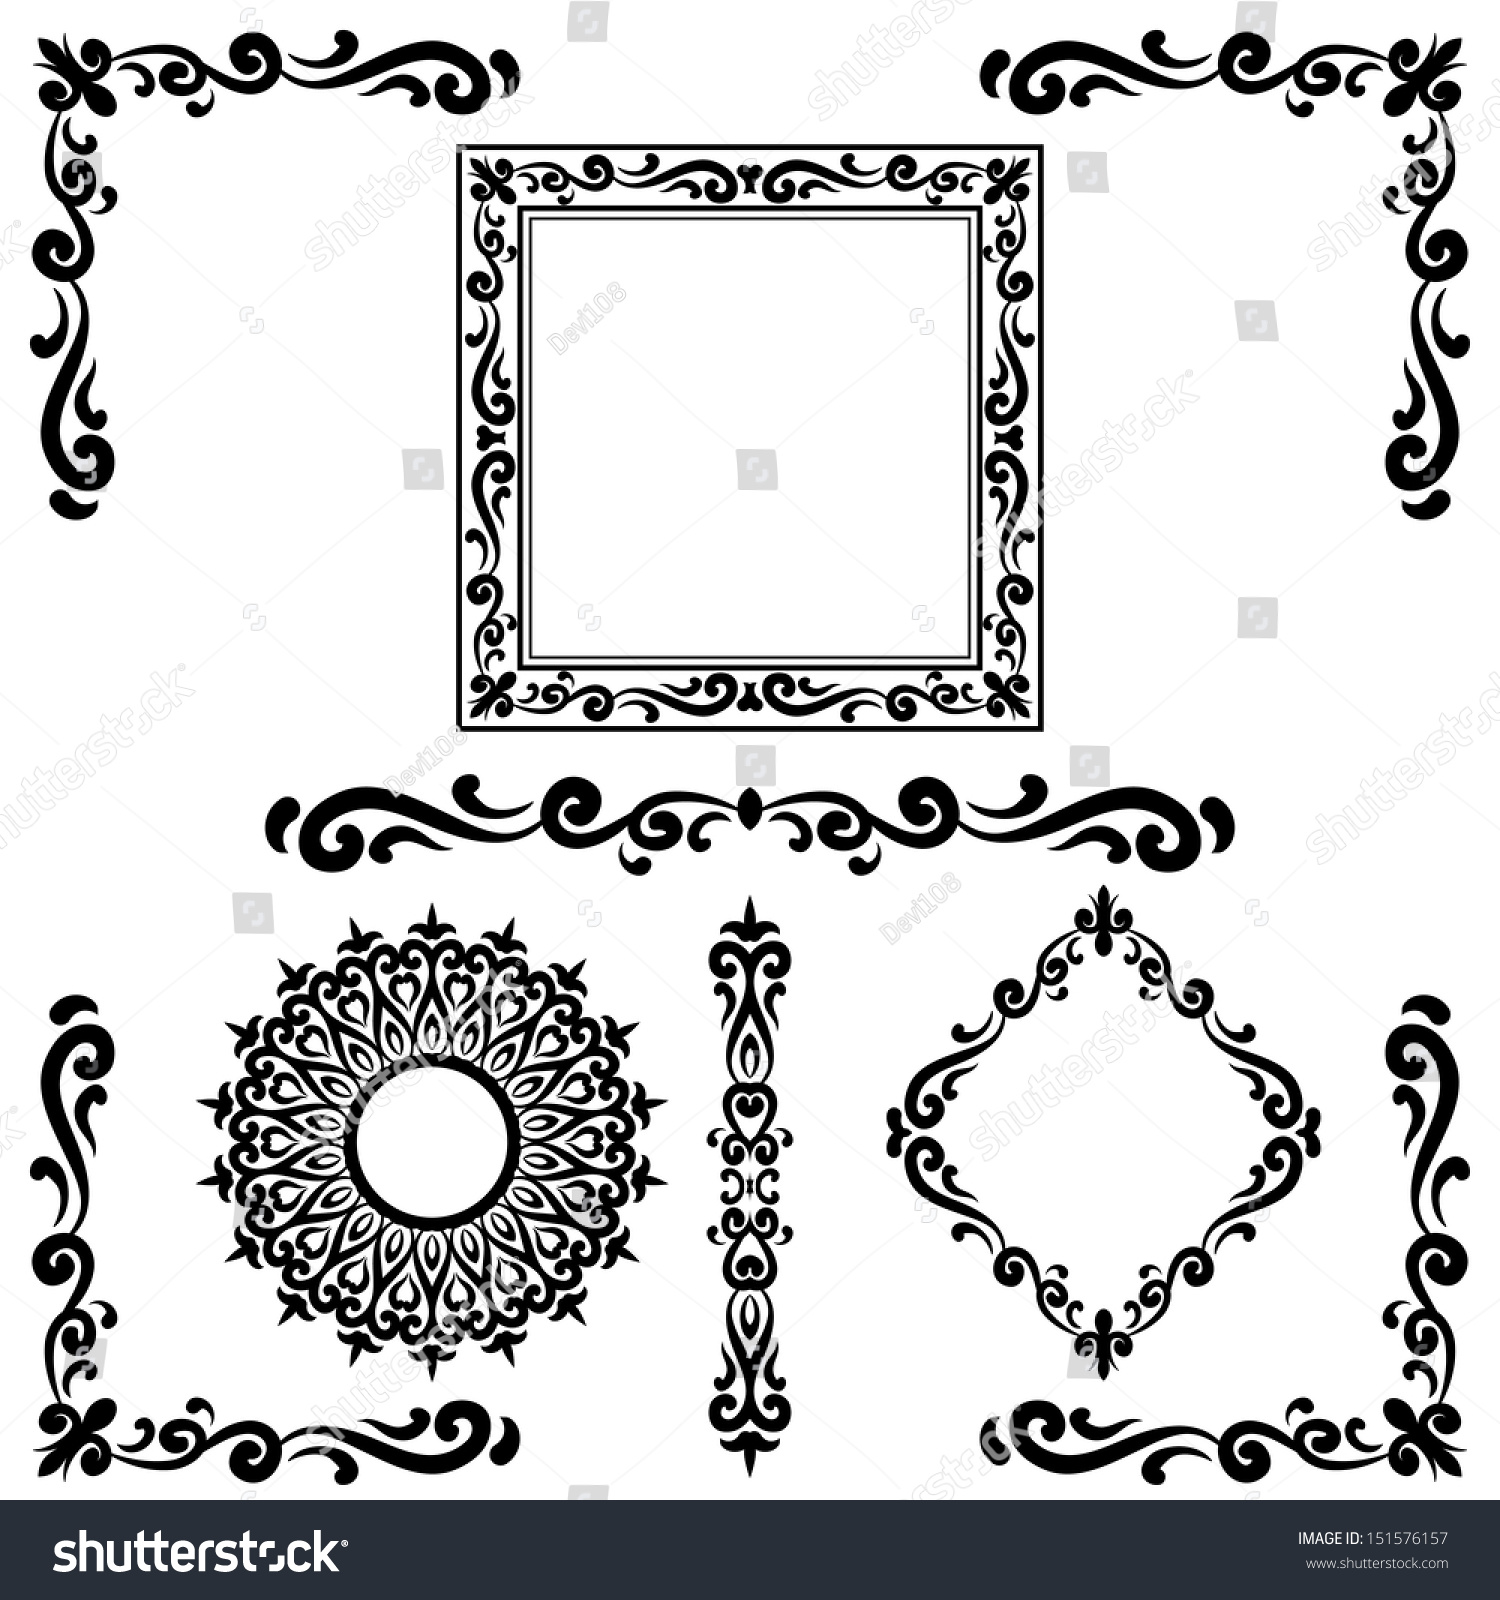 Pics For Gt Calligraphy Corner Border Designs